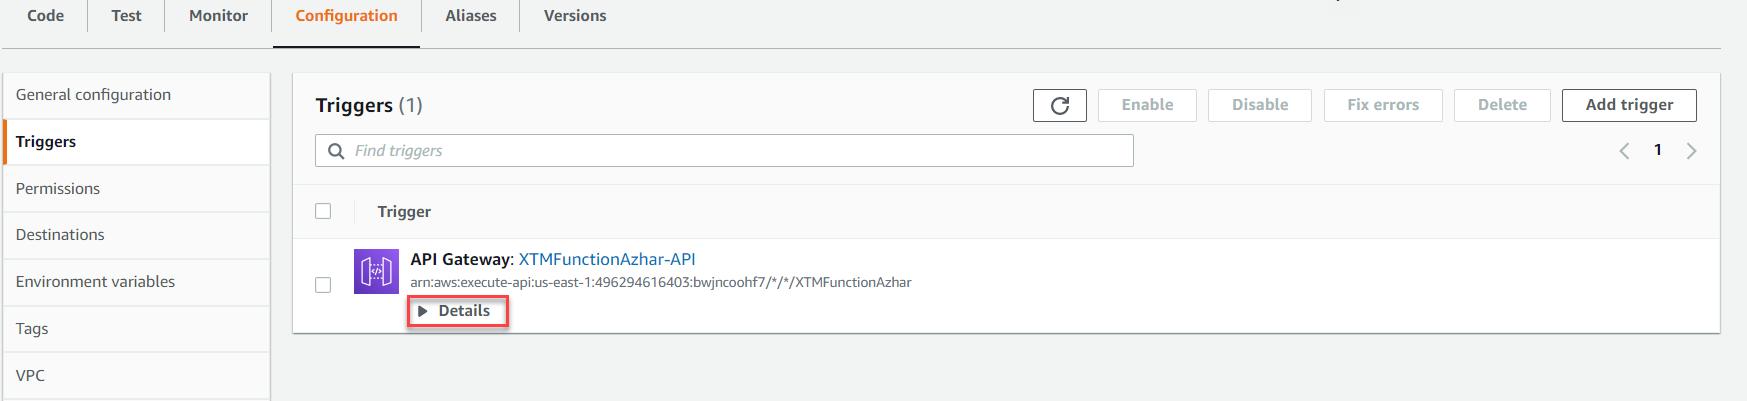 API_Gateway_for_LF_in_Human_Translation.png